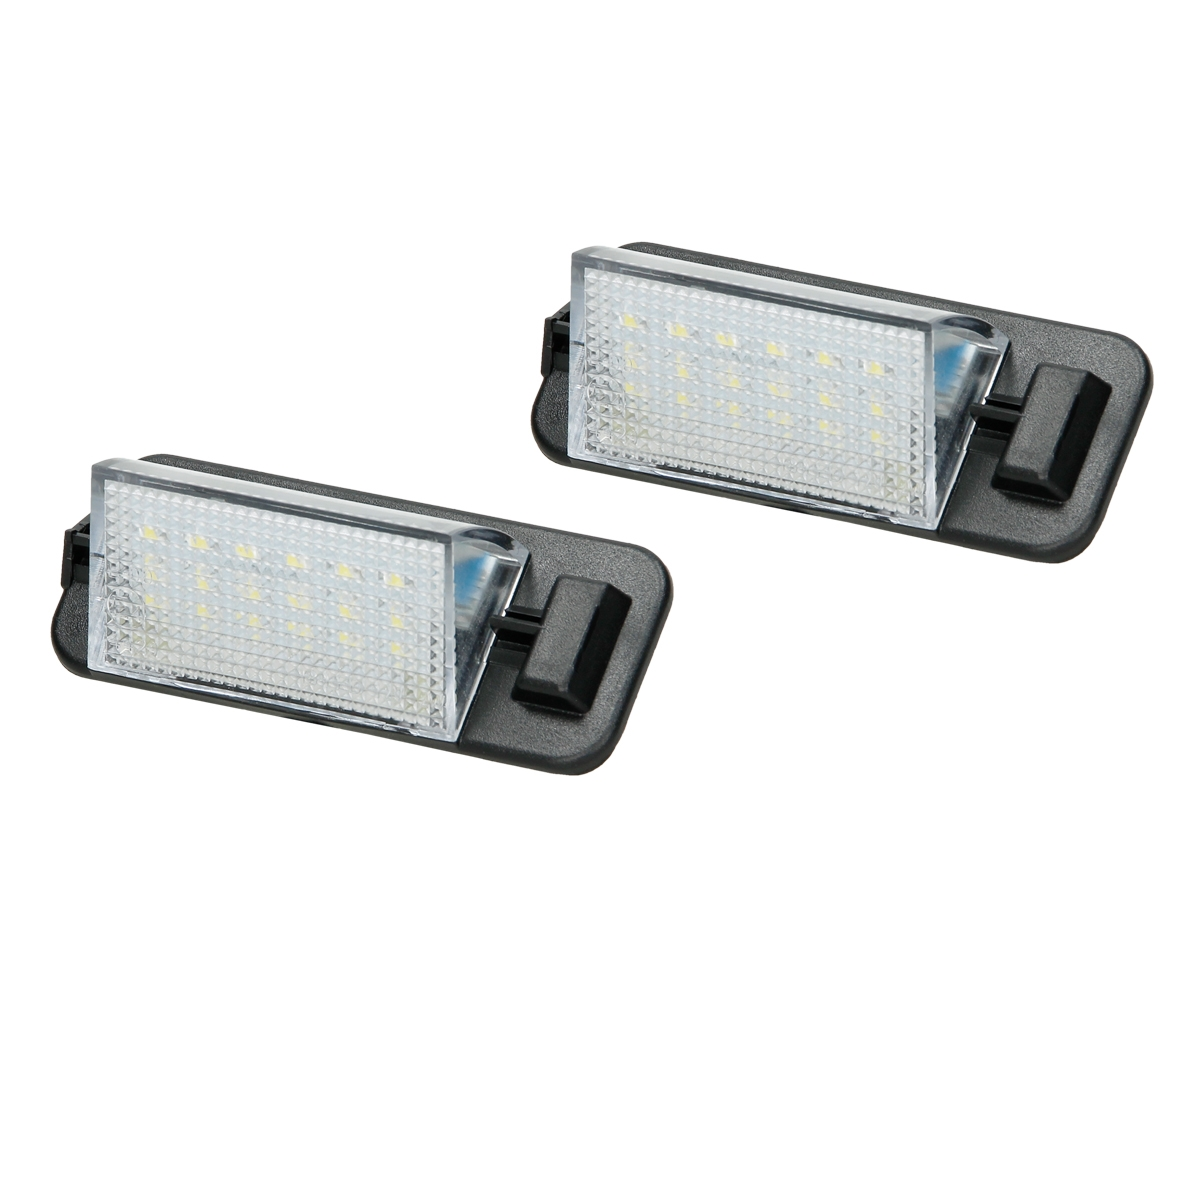 18 SMD LED Kennzeichen License Plate Light BMW E46 Limousine 98-03 E-Prüfzeichen